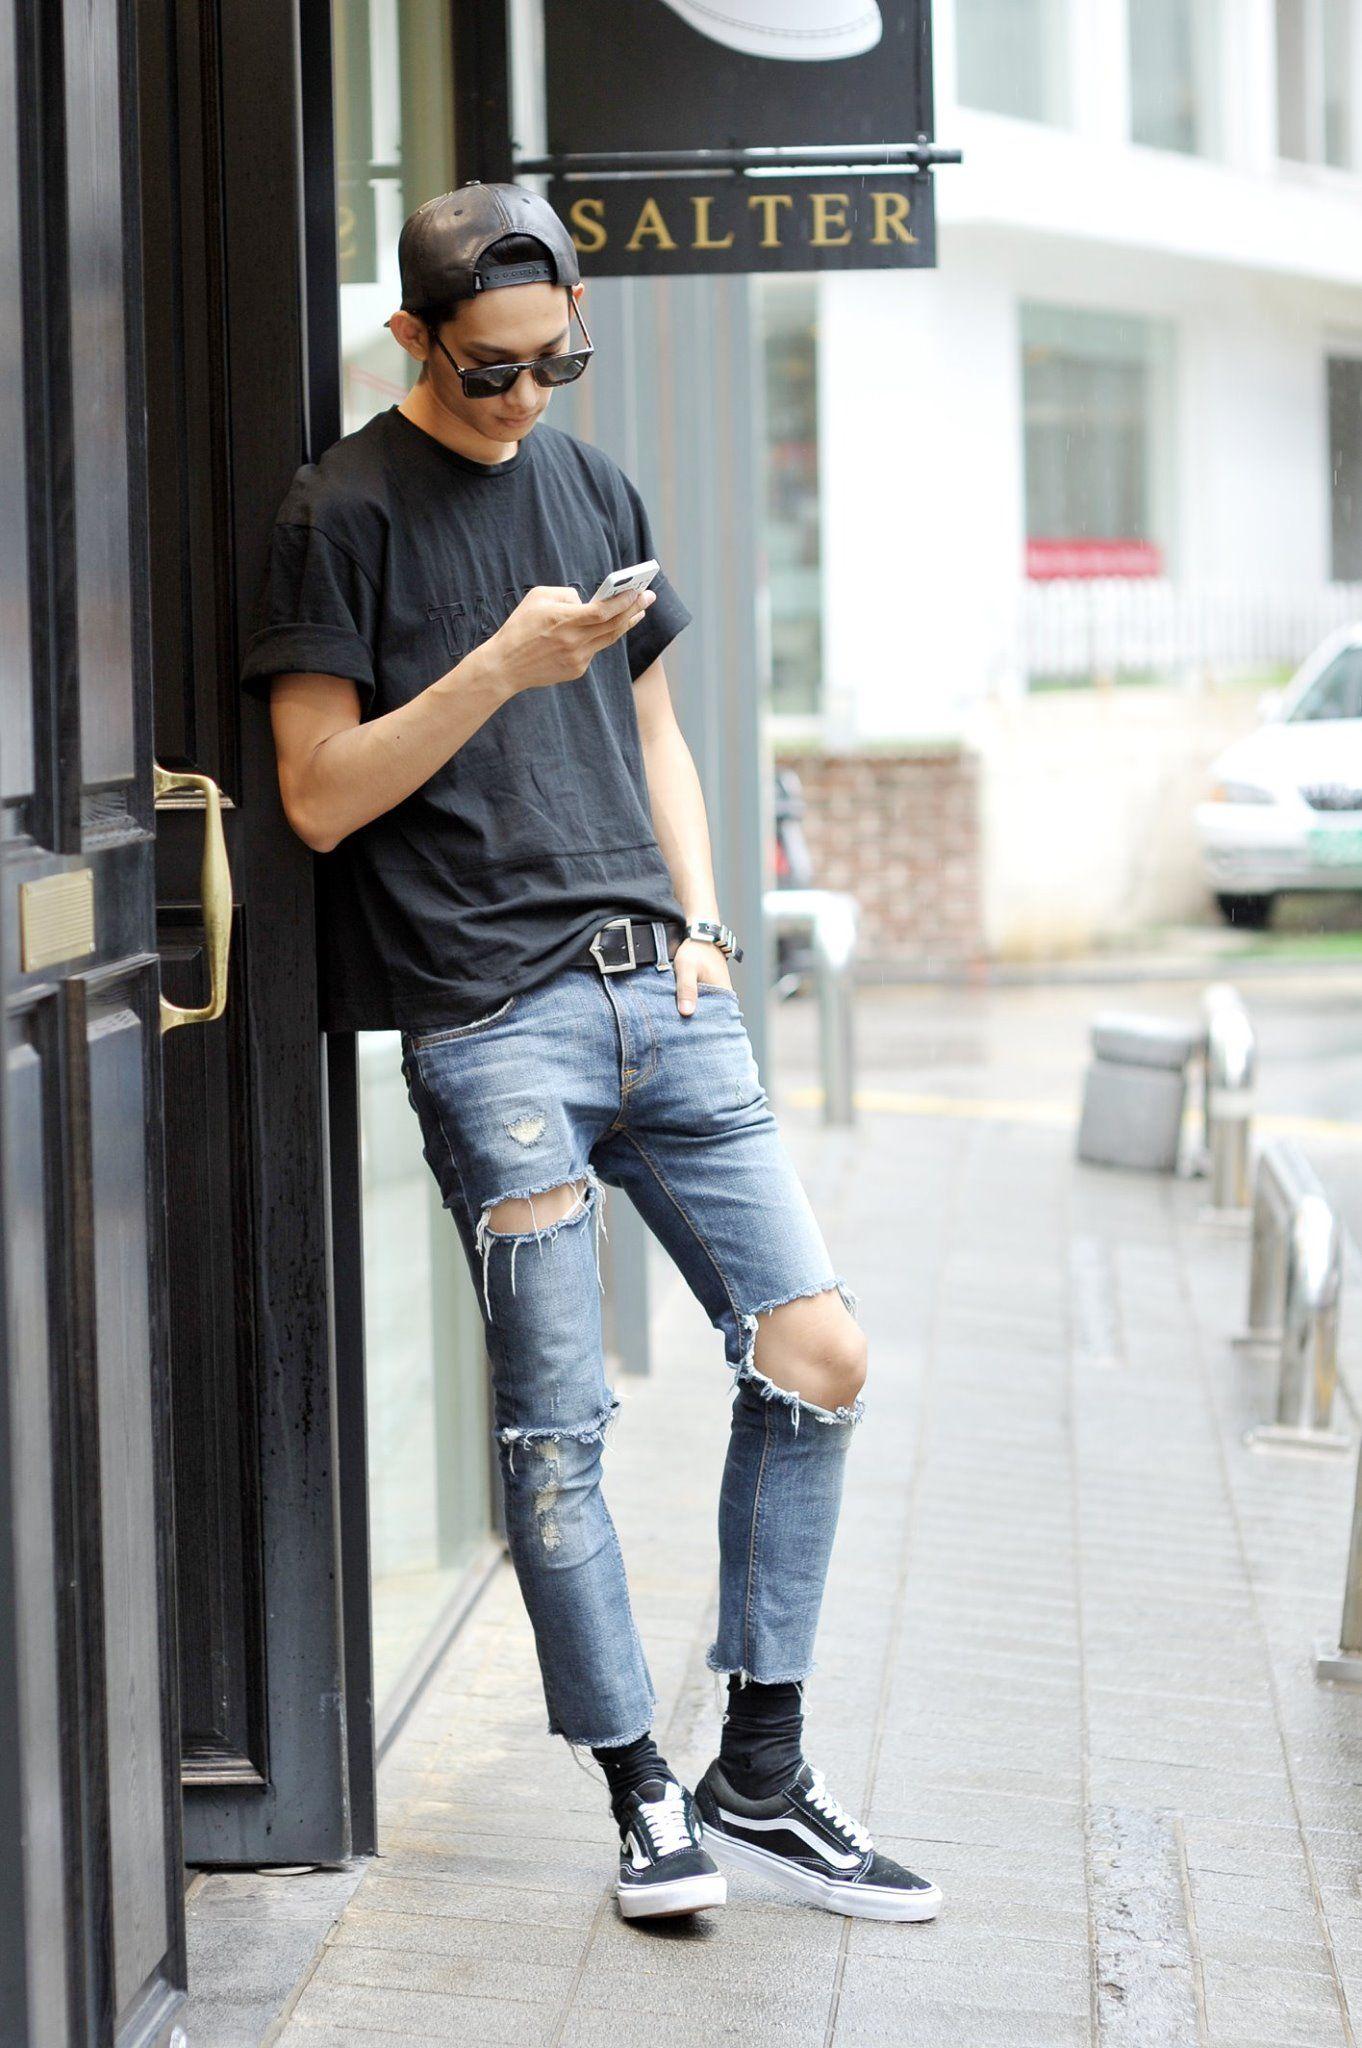 Sub Park // Park HyeongSeob // YGK+ // Korea Models // Korea Boys // TopModels // YG Kplus // K+ // Kplus // Kplus Models